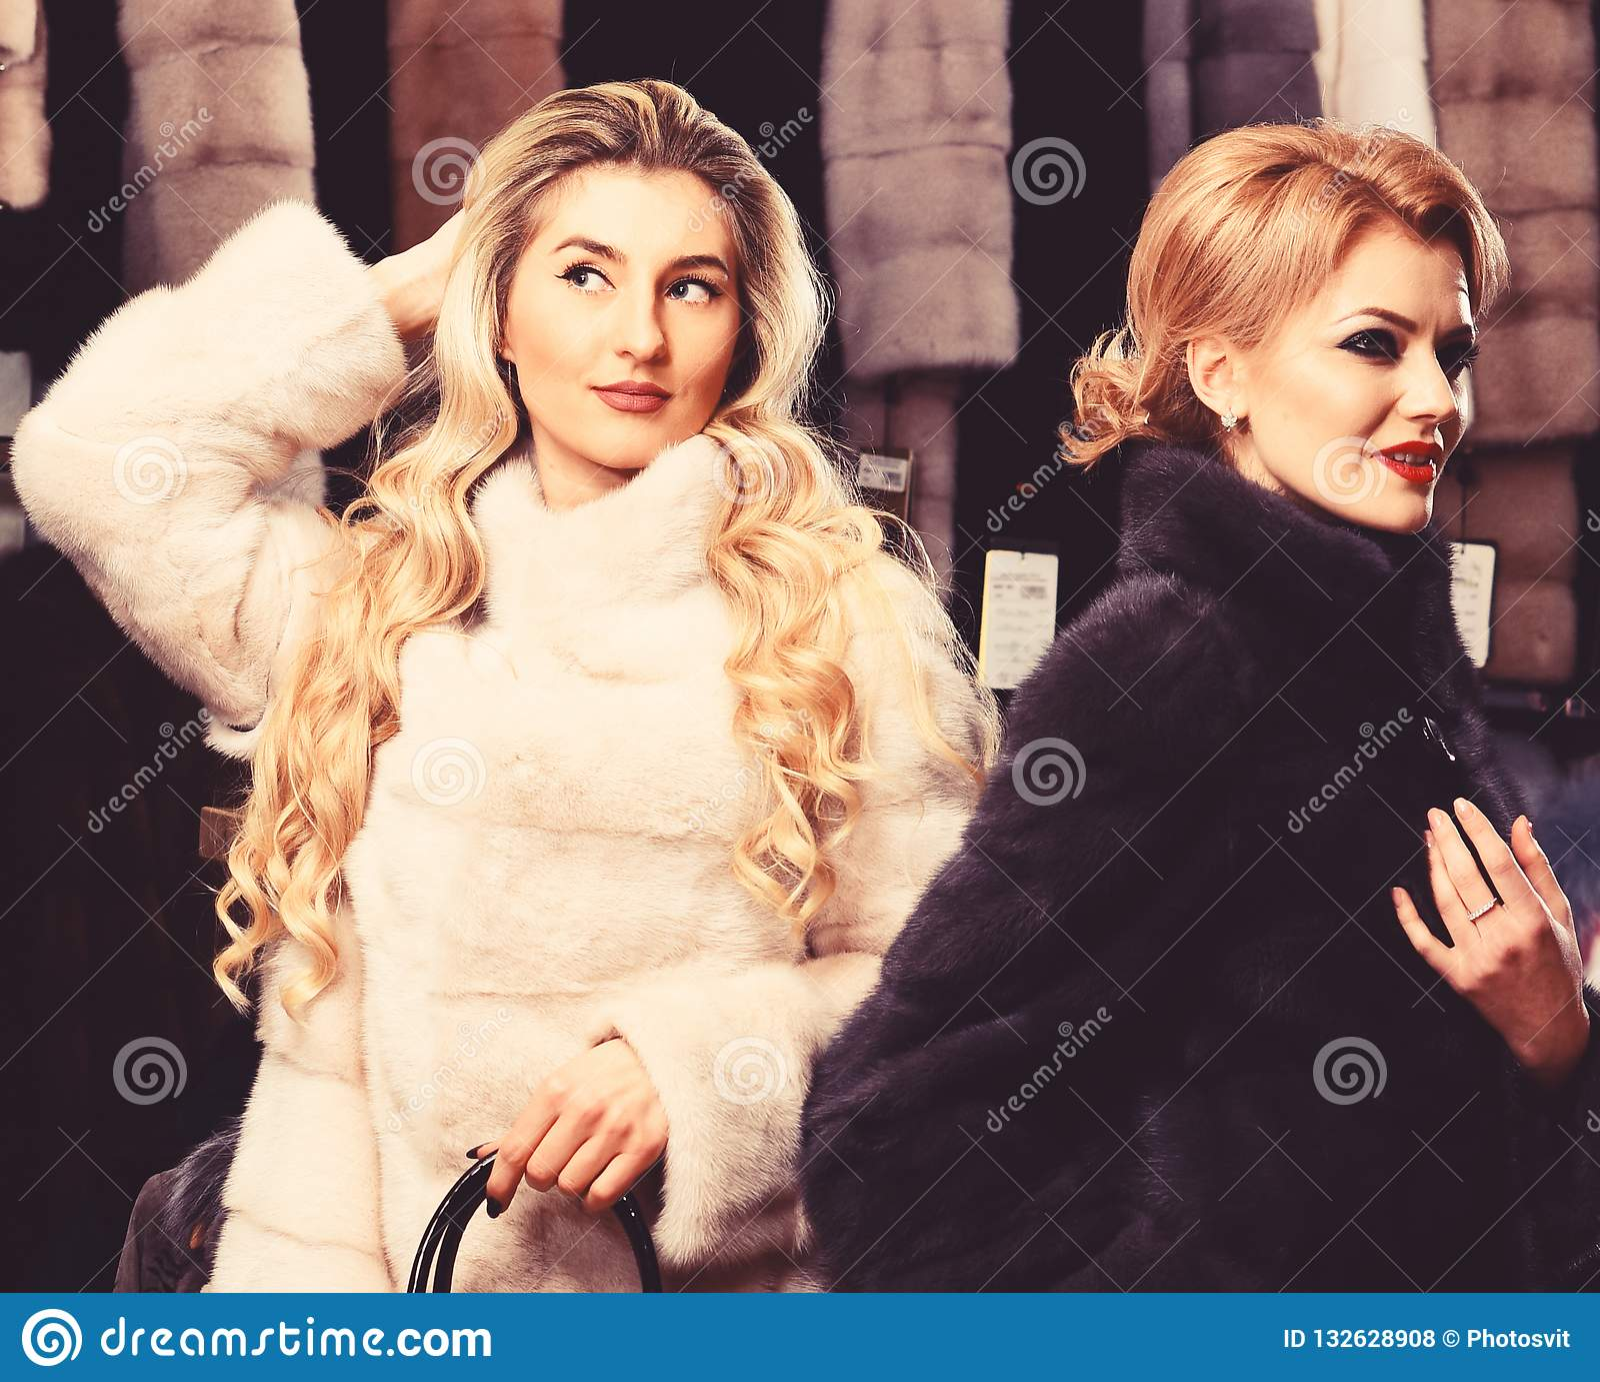 ladies in fur coats